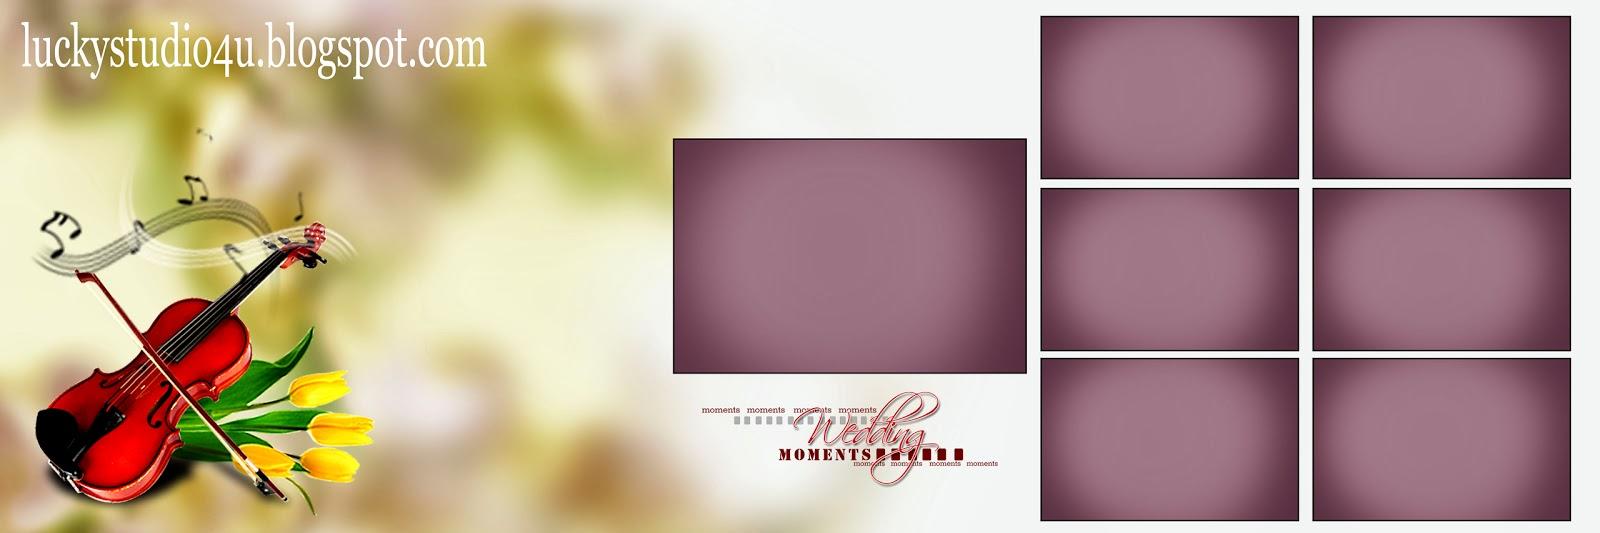 Karizma Album Psd 12x36 Template Free Download - Luckystudio4u Karizma Wedding Album Software Free Download